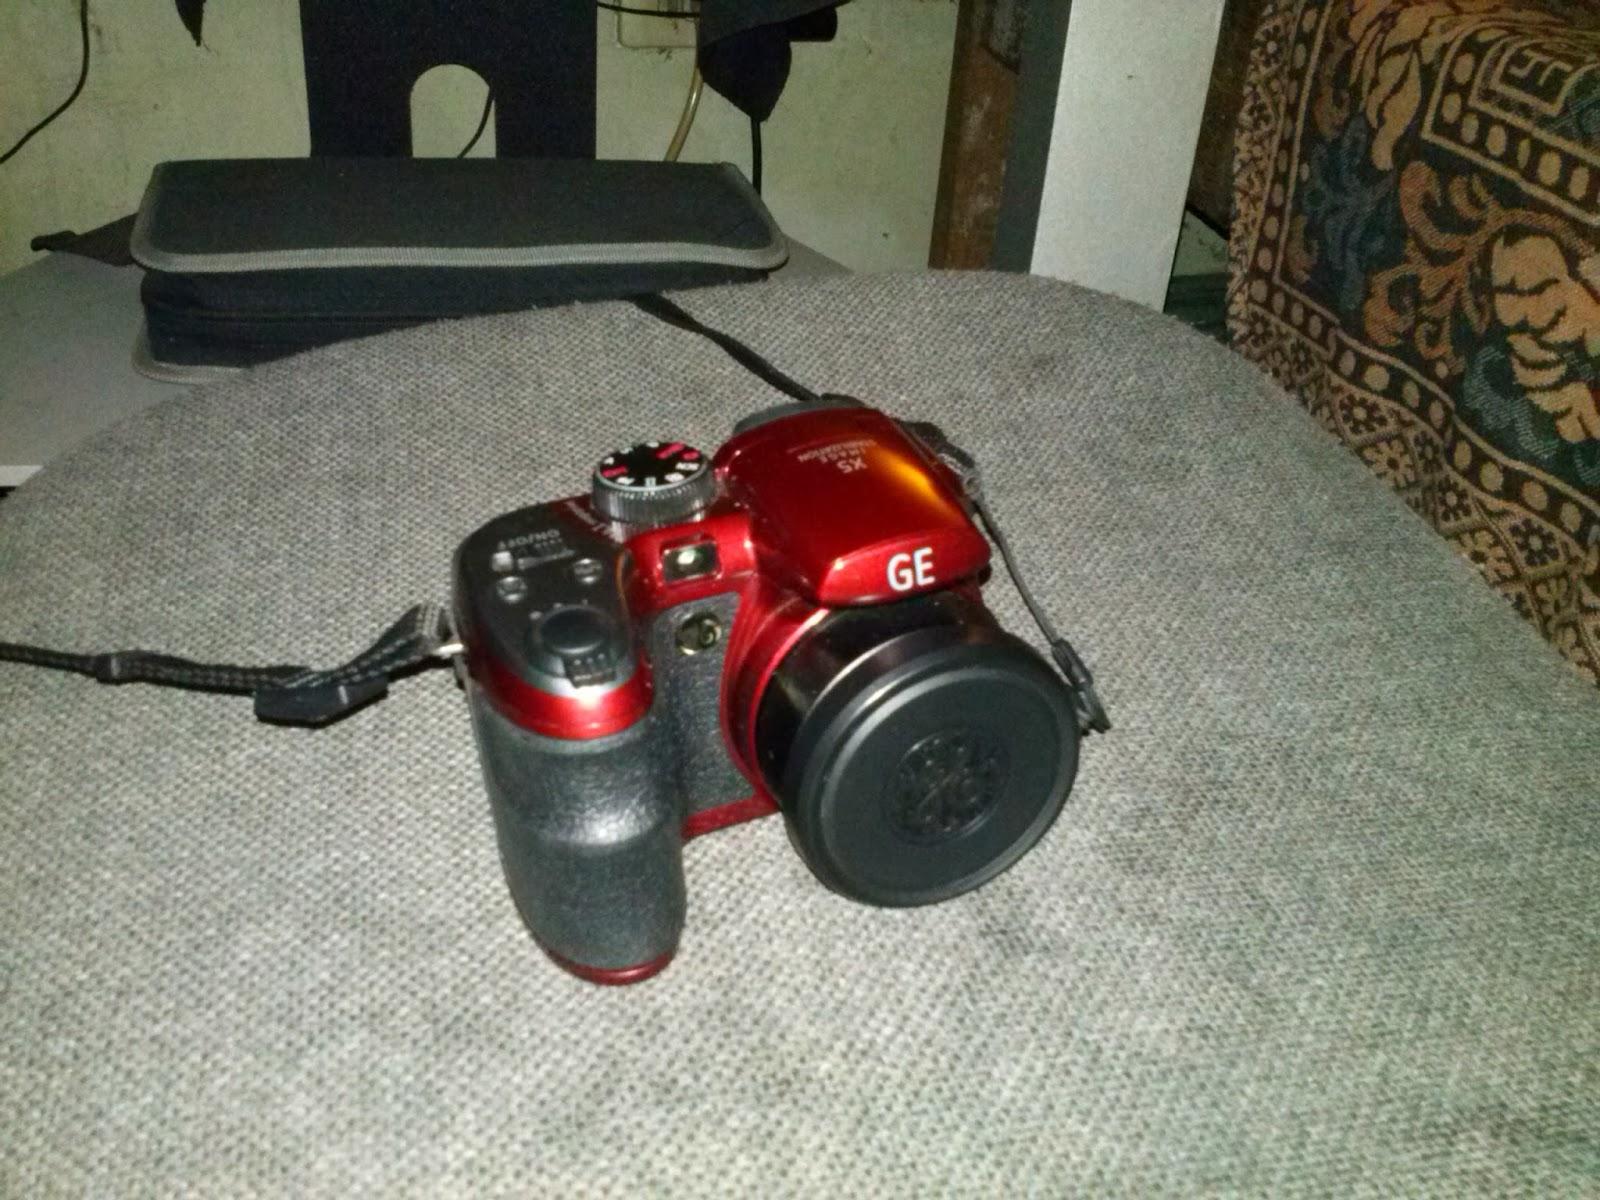 ge x5 super zoom digital camera review roborat gadgetfreaks rh roborat gadgetfreak blogspot com GE X600 Digital Camera Walmart GE Digital Camera Accessories